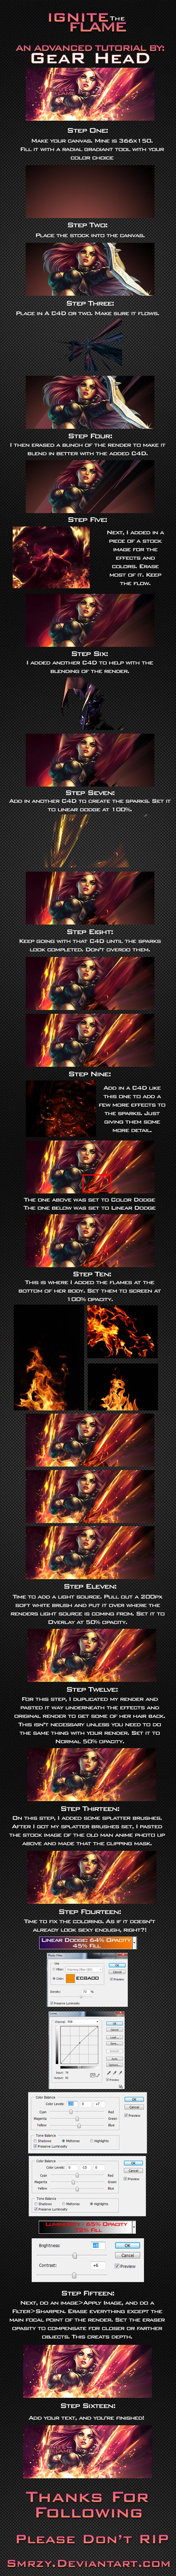 Ignite The Flame Tutorial by smrzy